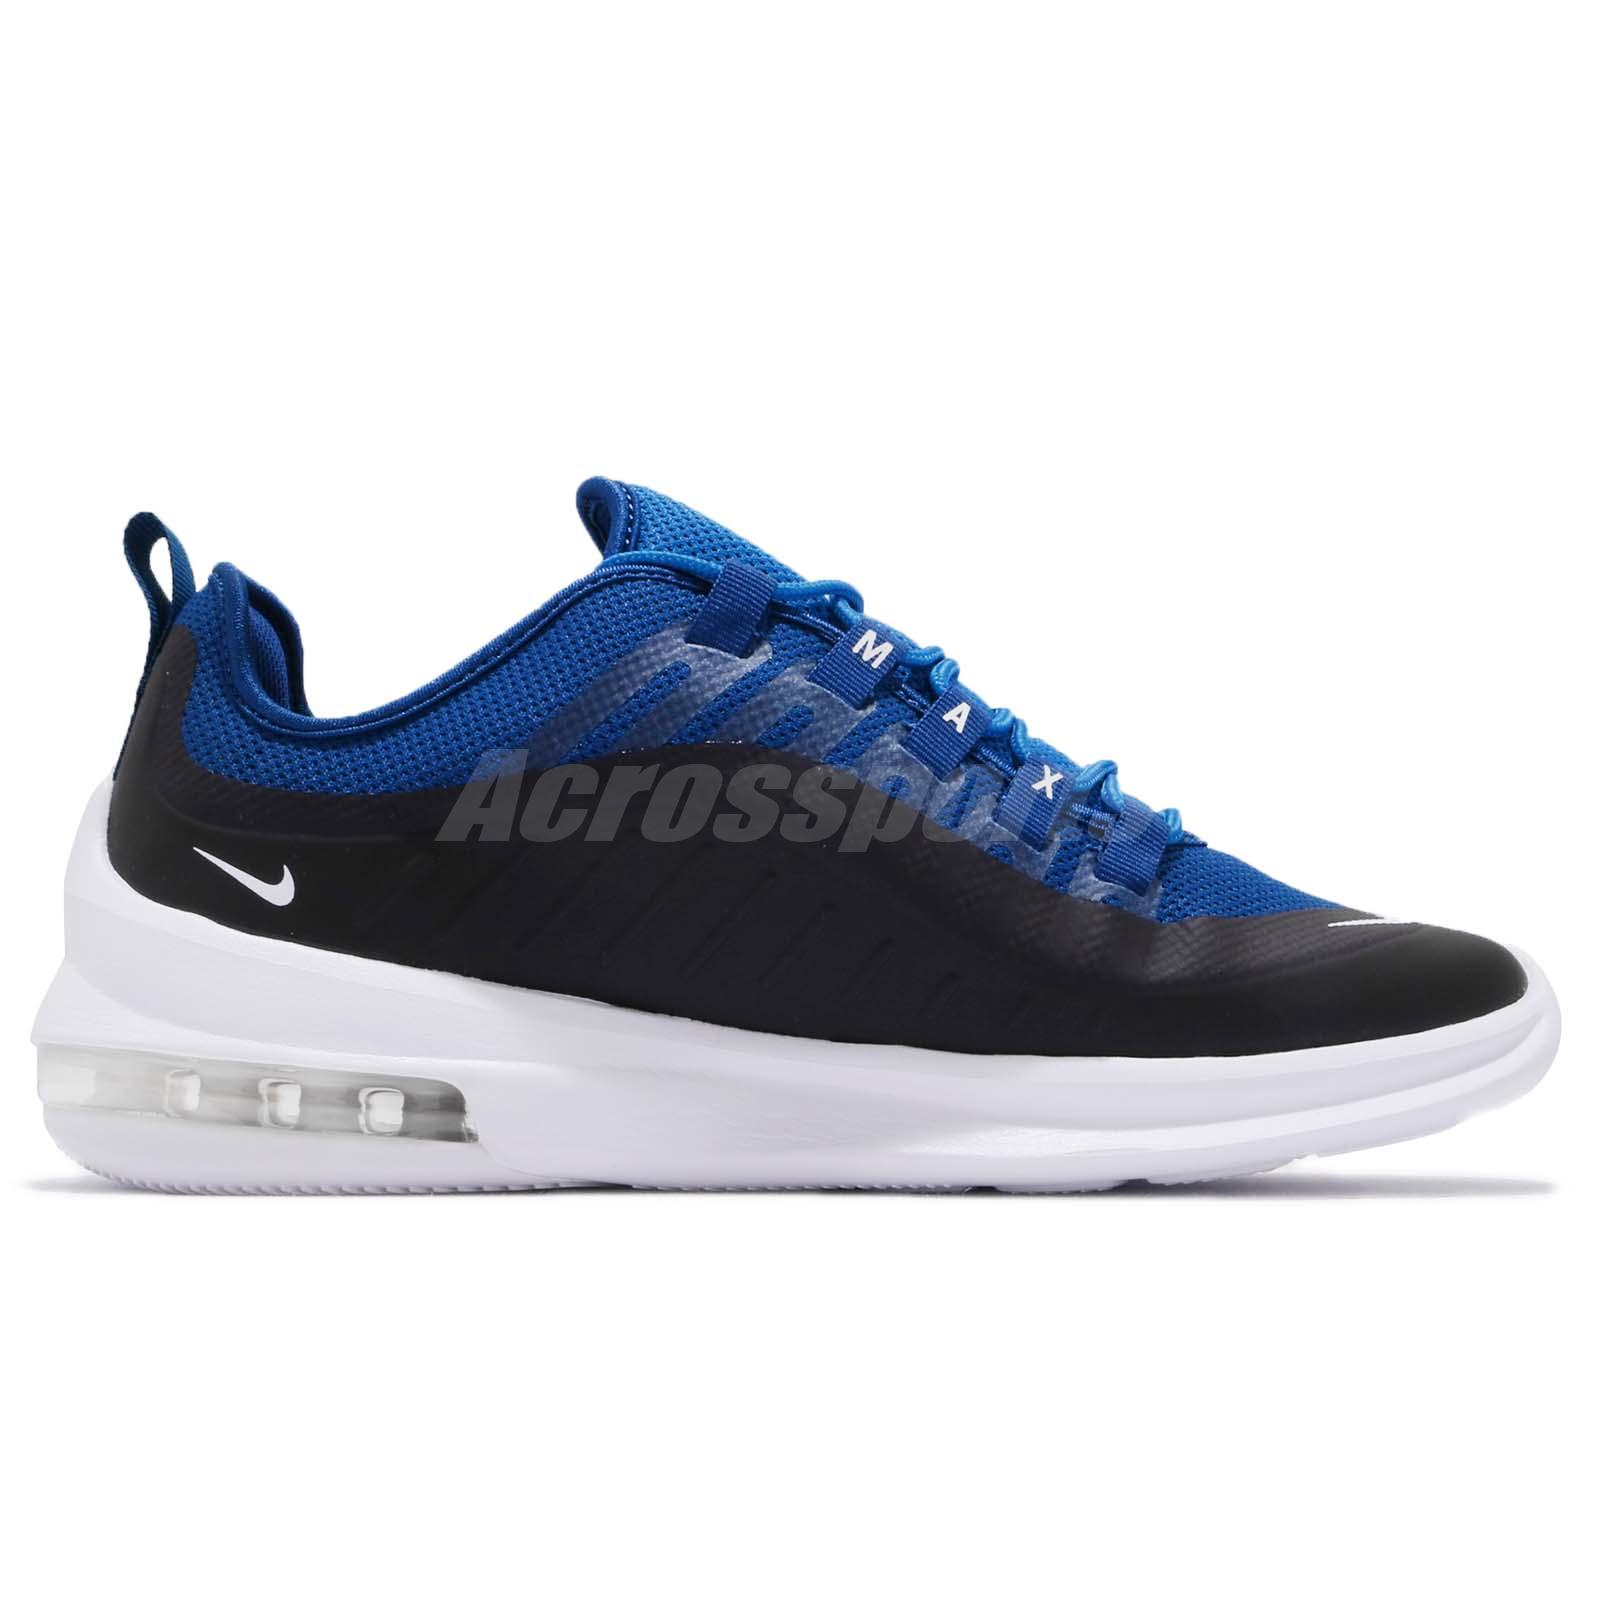 4edba3848d8c8 Nike Air Max Axis Black Blue White Men Running Casual Shoes Sneakers ...